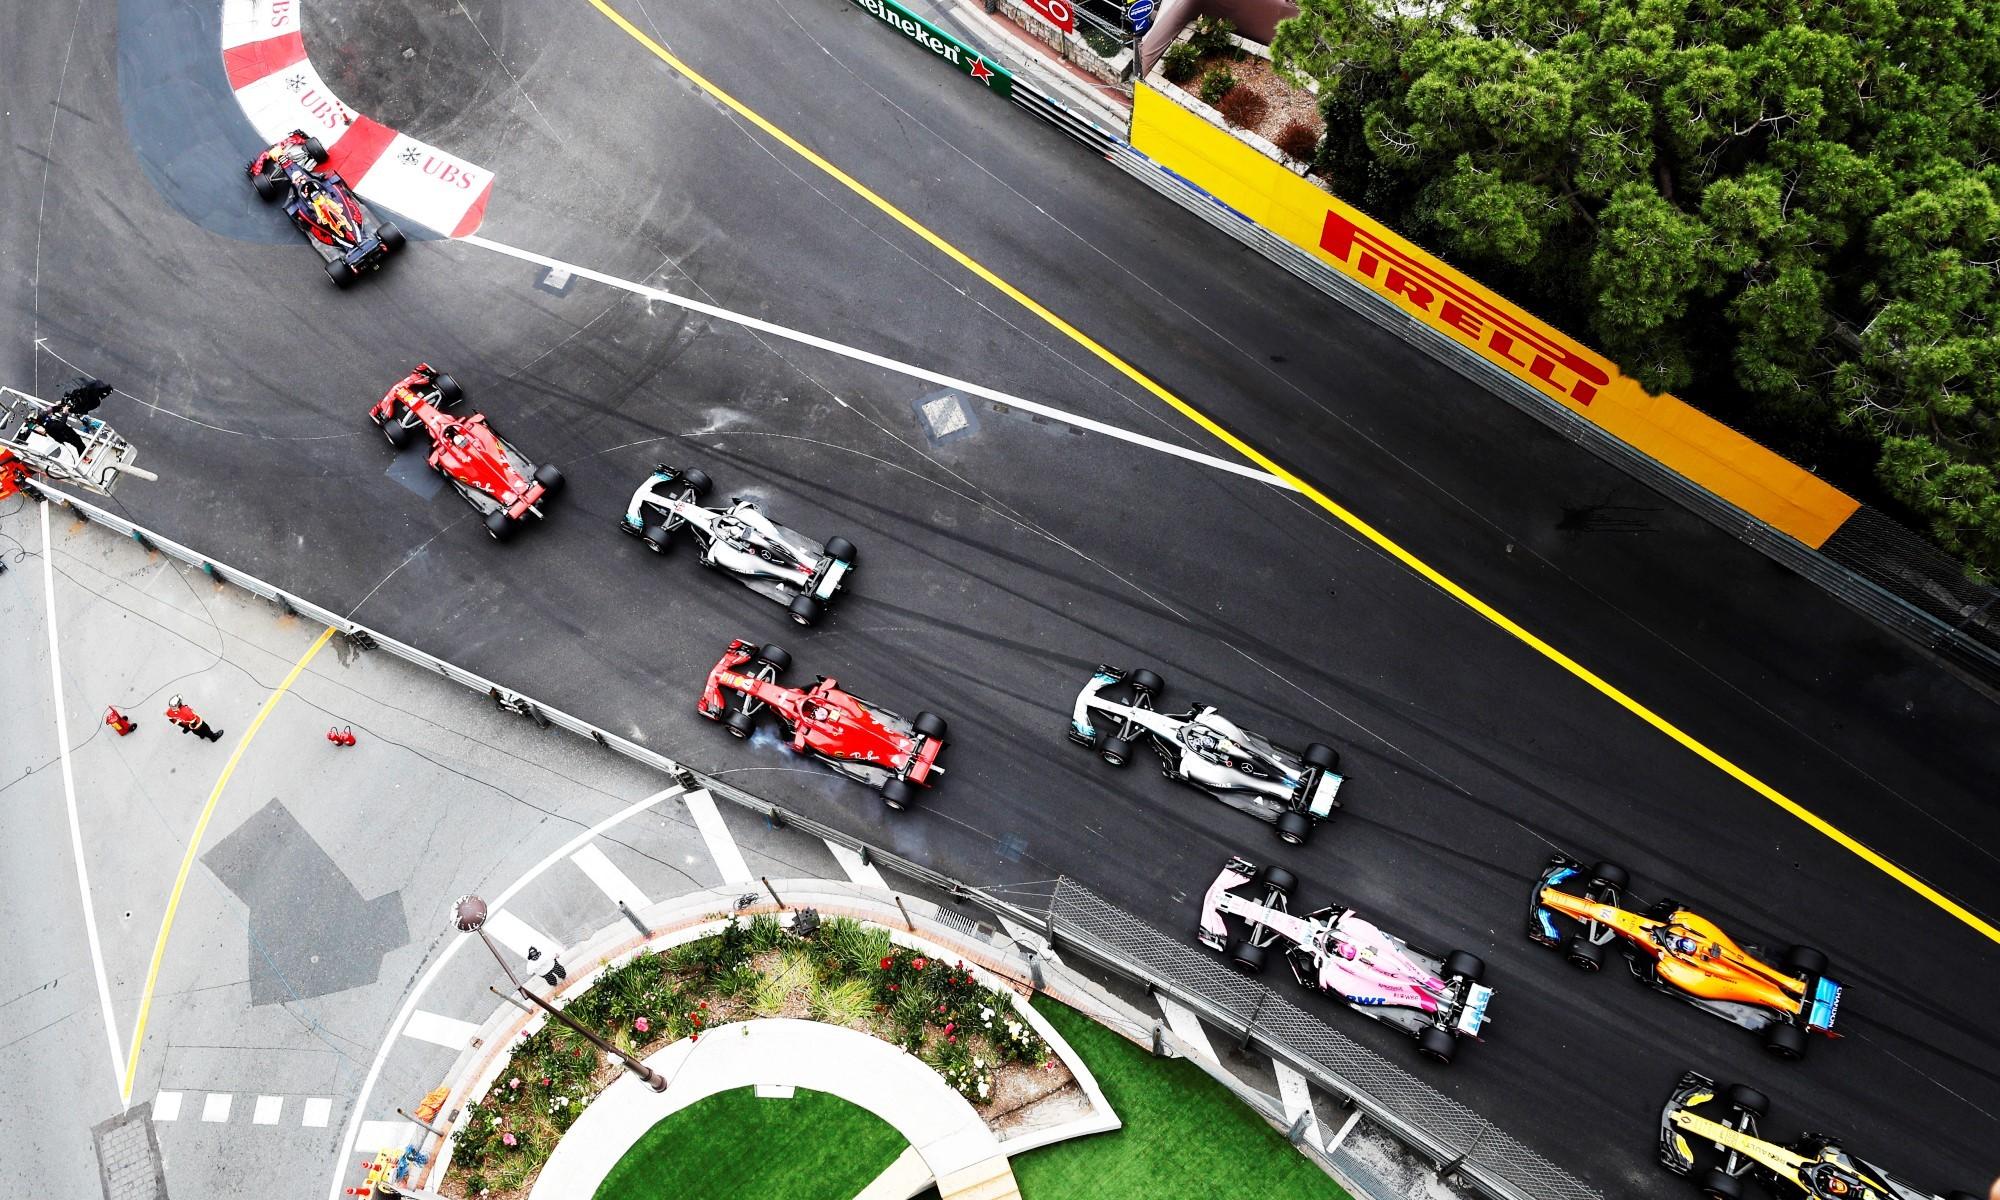 The run into T1 at the start. Image Pirelli Motorsport